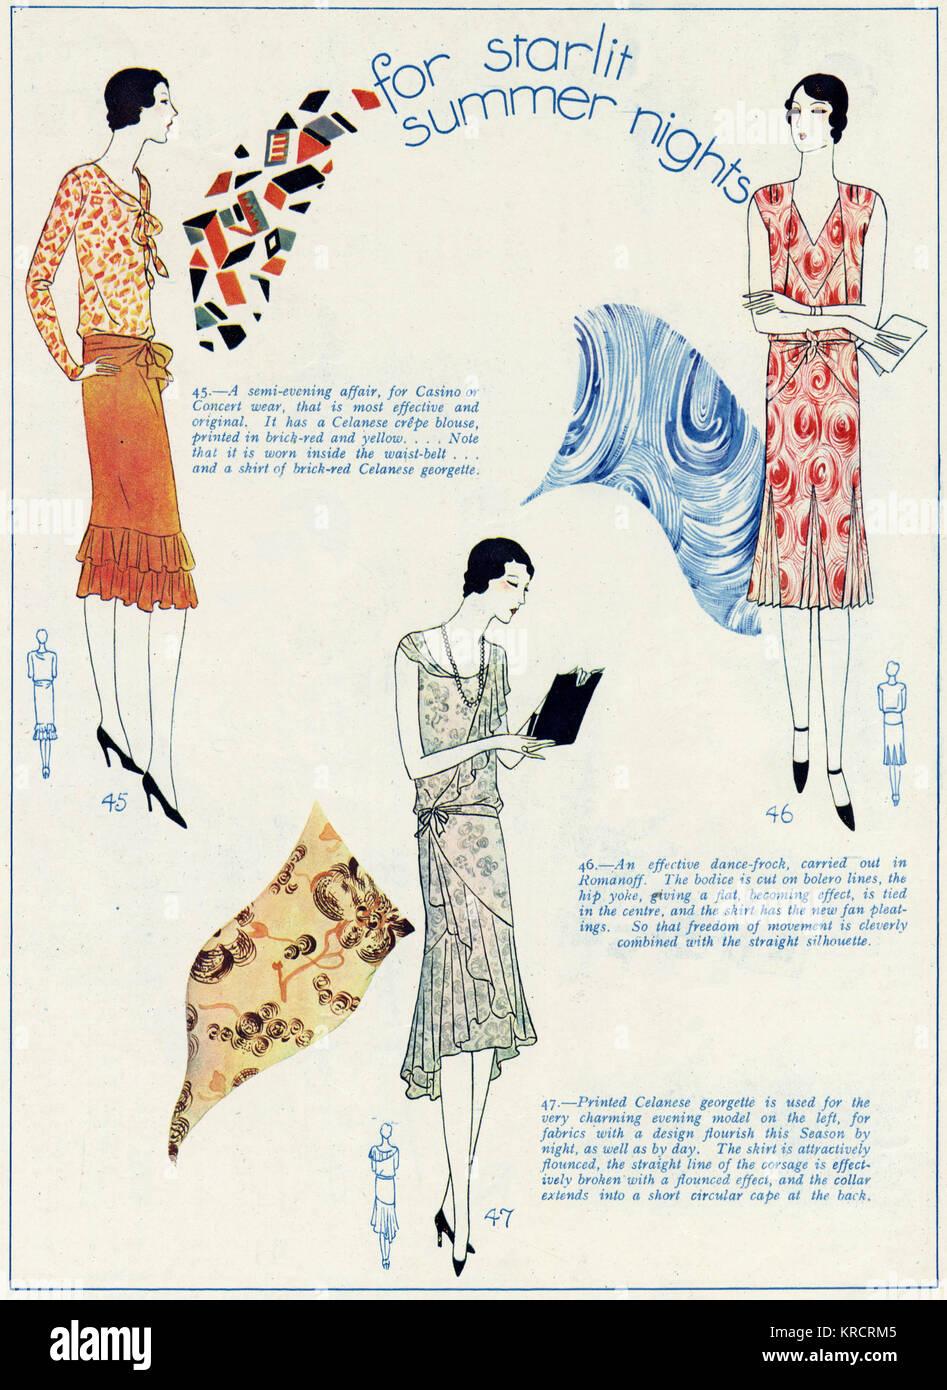 Womens Fashion 1920s Imágenes De Stock & Womens Fashion 1920s Fotos ...